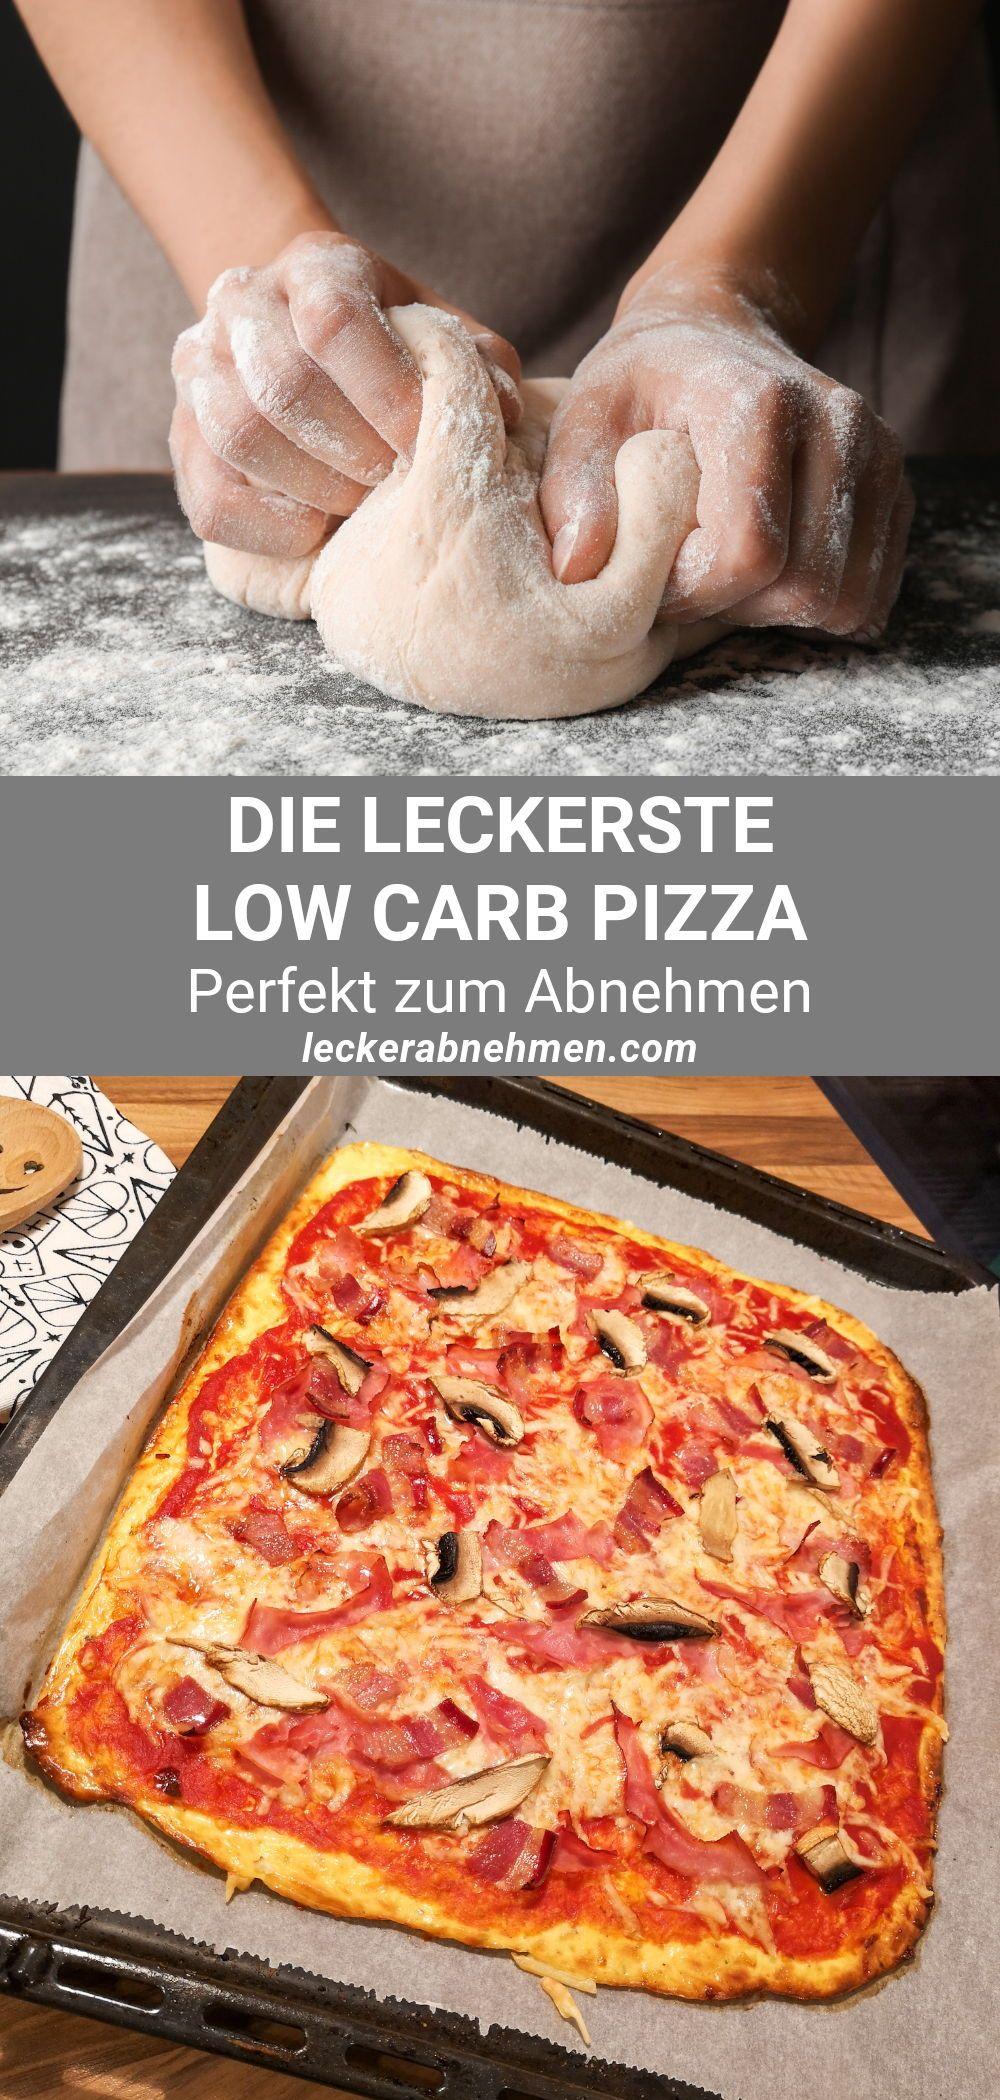 Low Carb Pizzateig ohne Hefe - Gesunde Pizza vom Blech